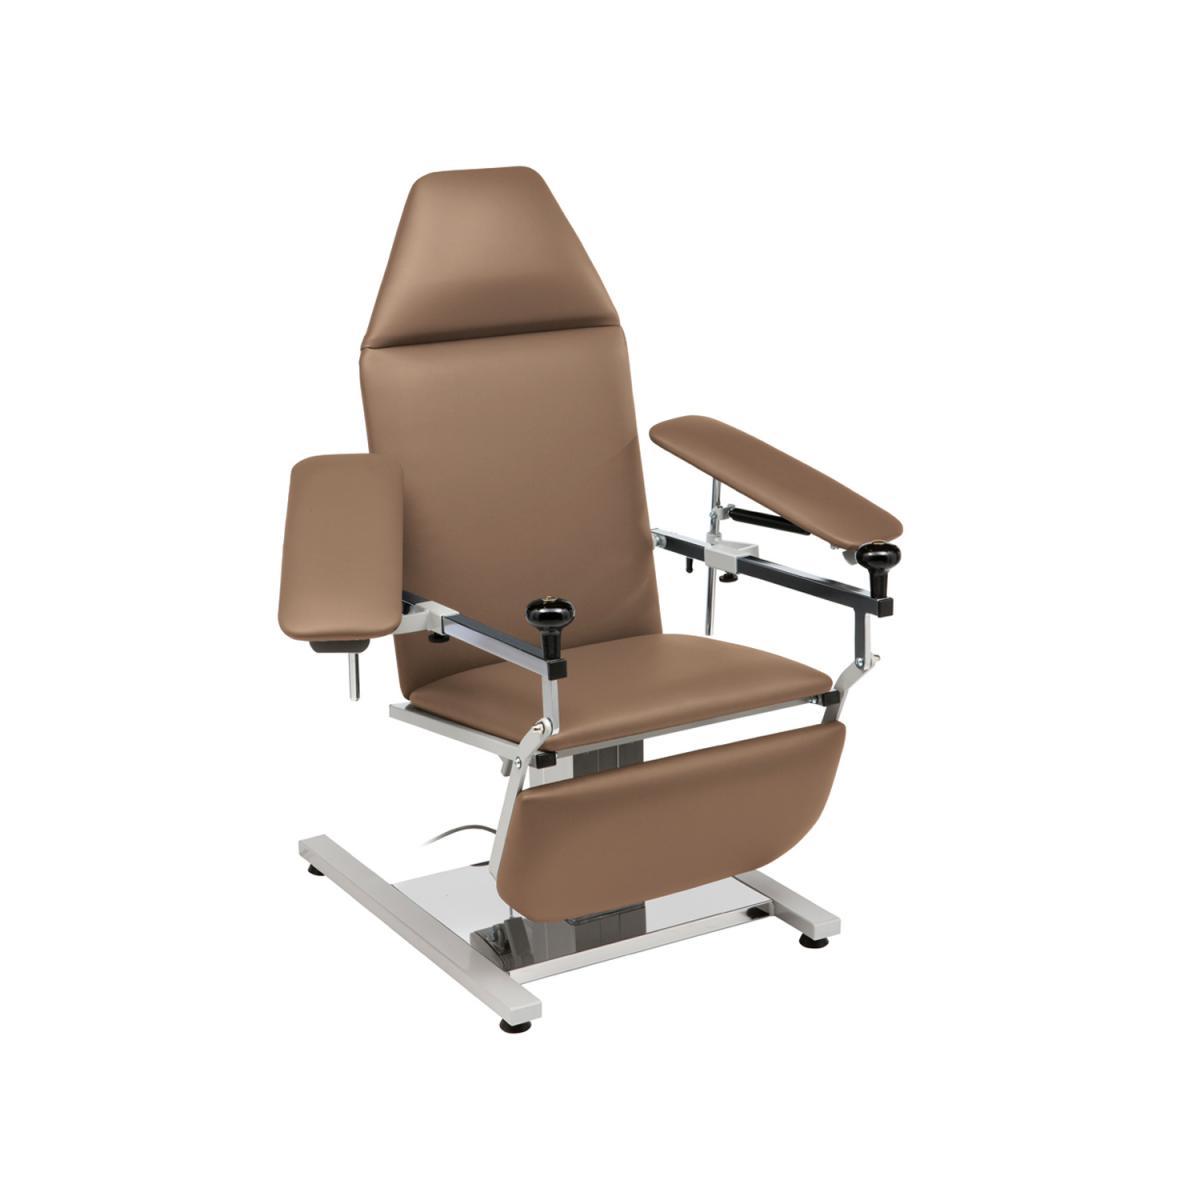 Sampling chair 413